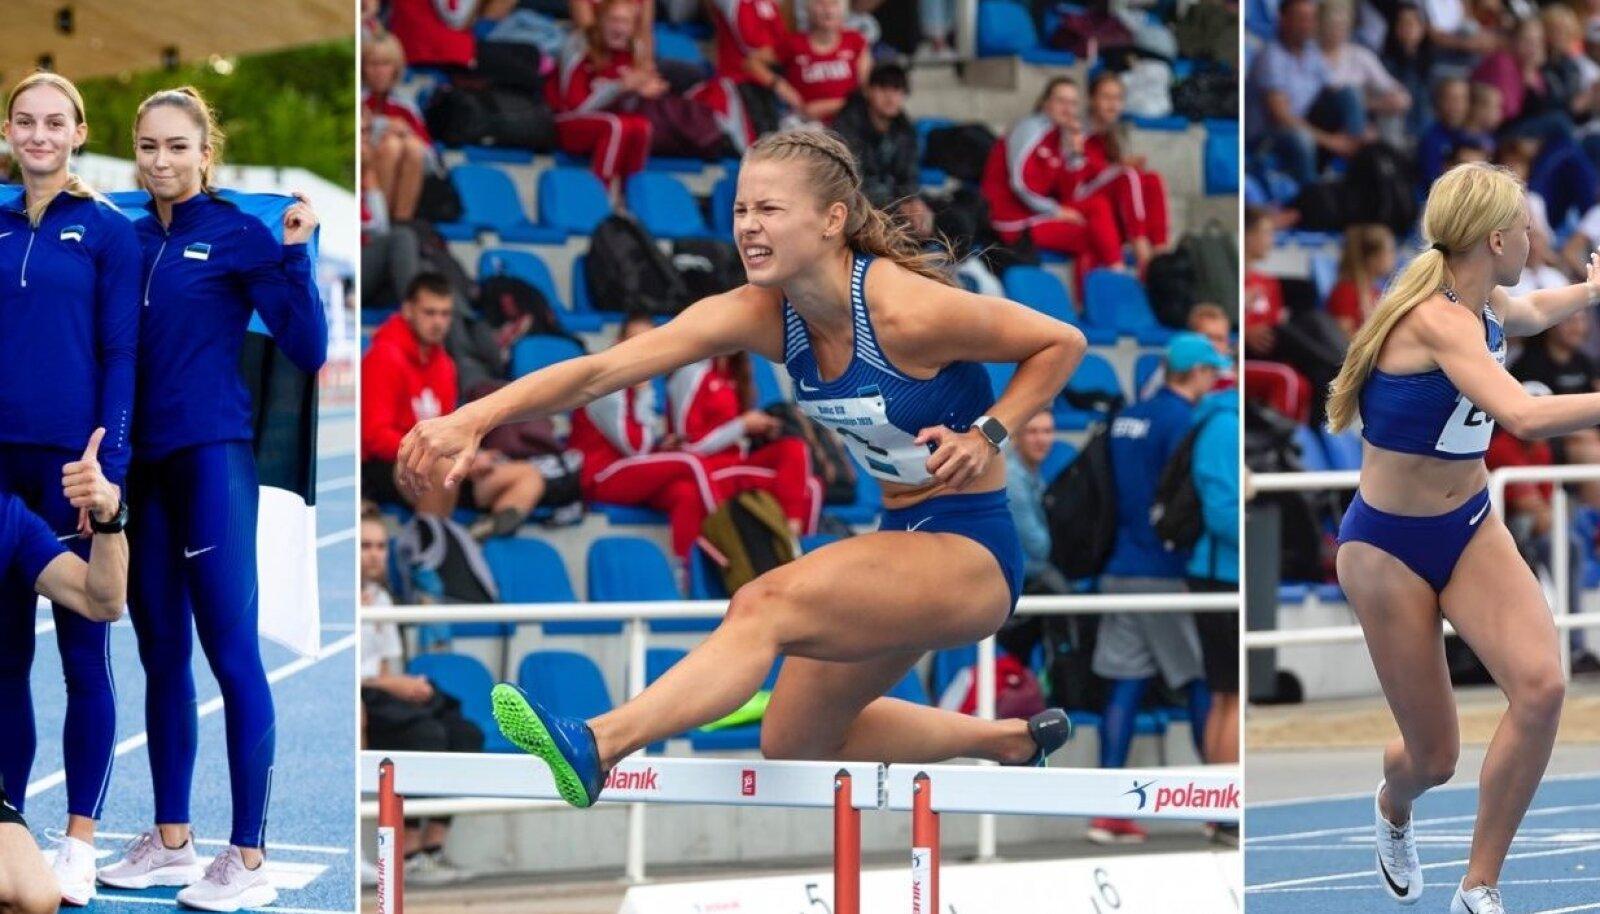 Balti kergejõustiku meistrivõistlustel sündis kolm noorteklassi rekordit